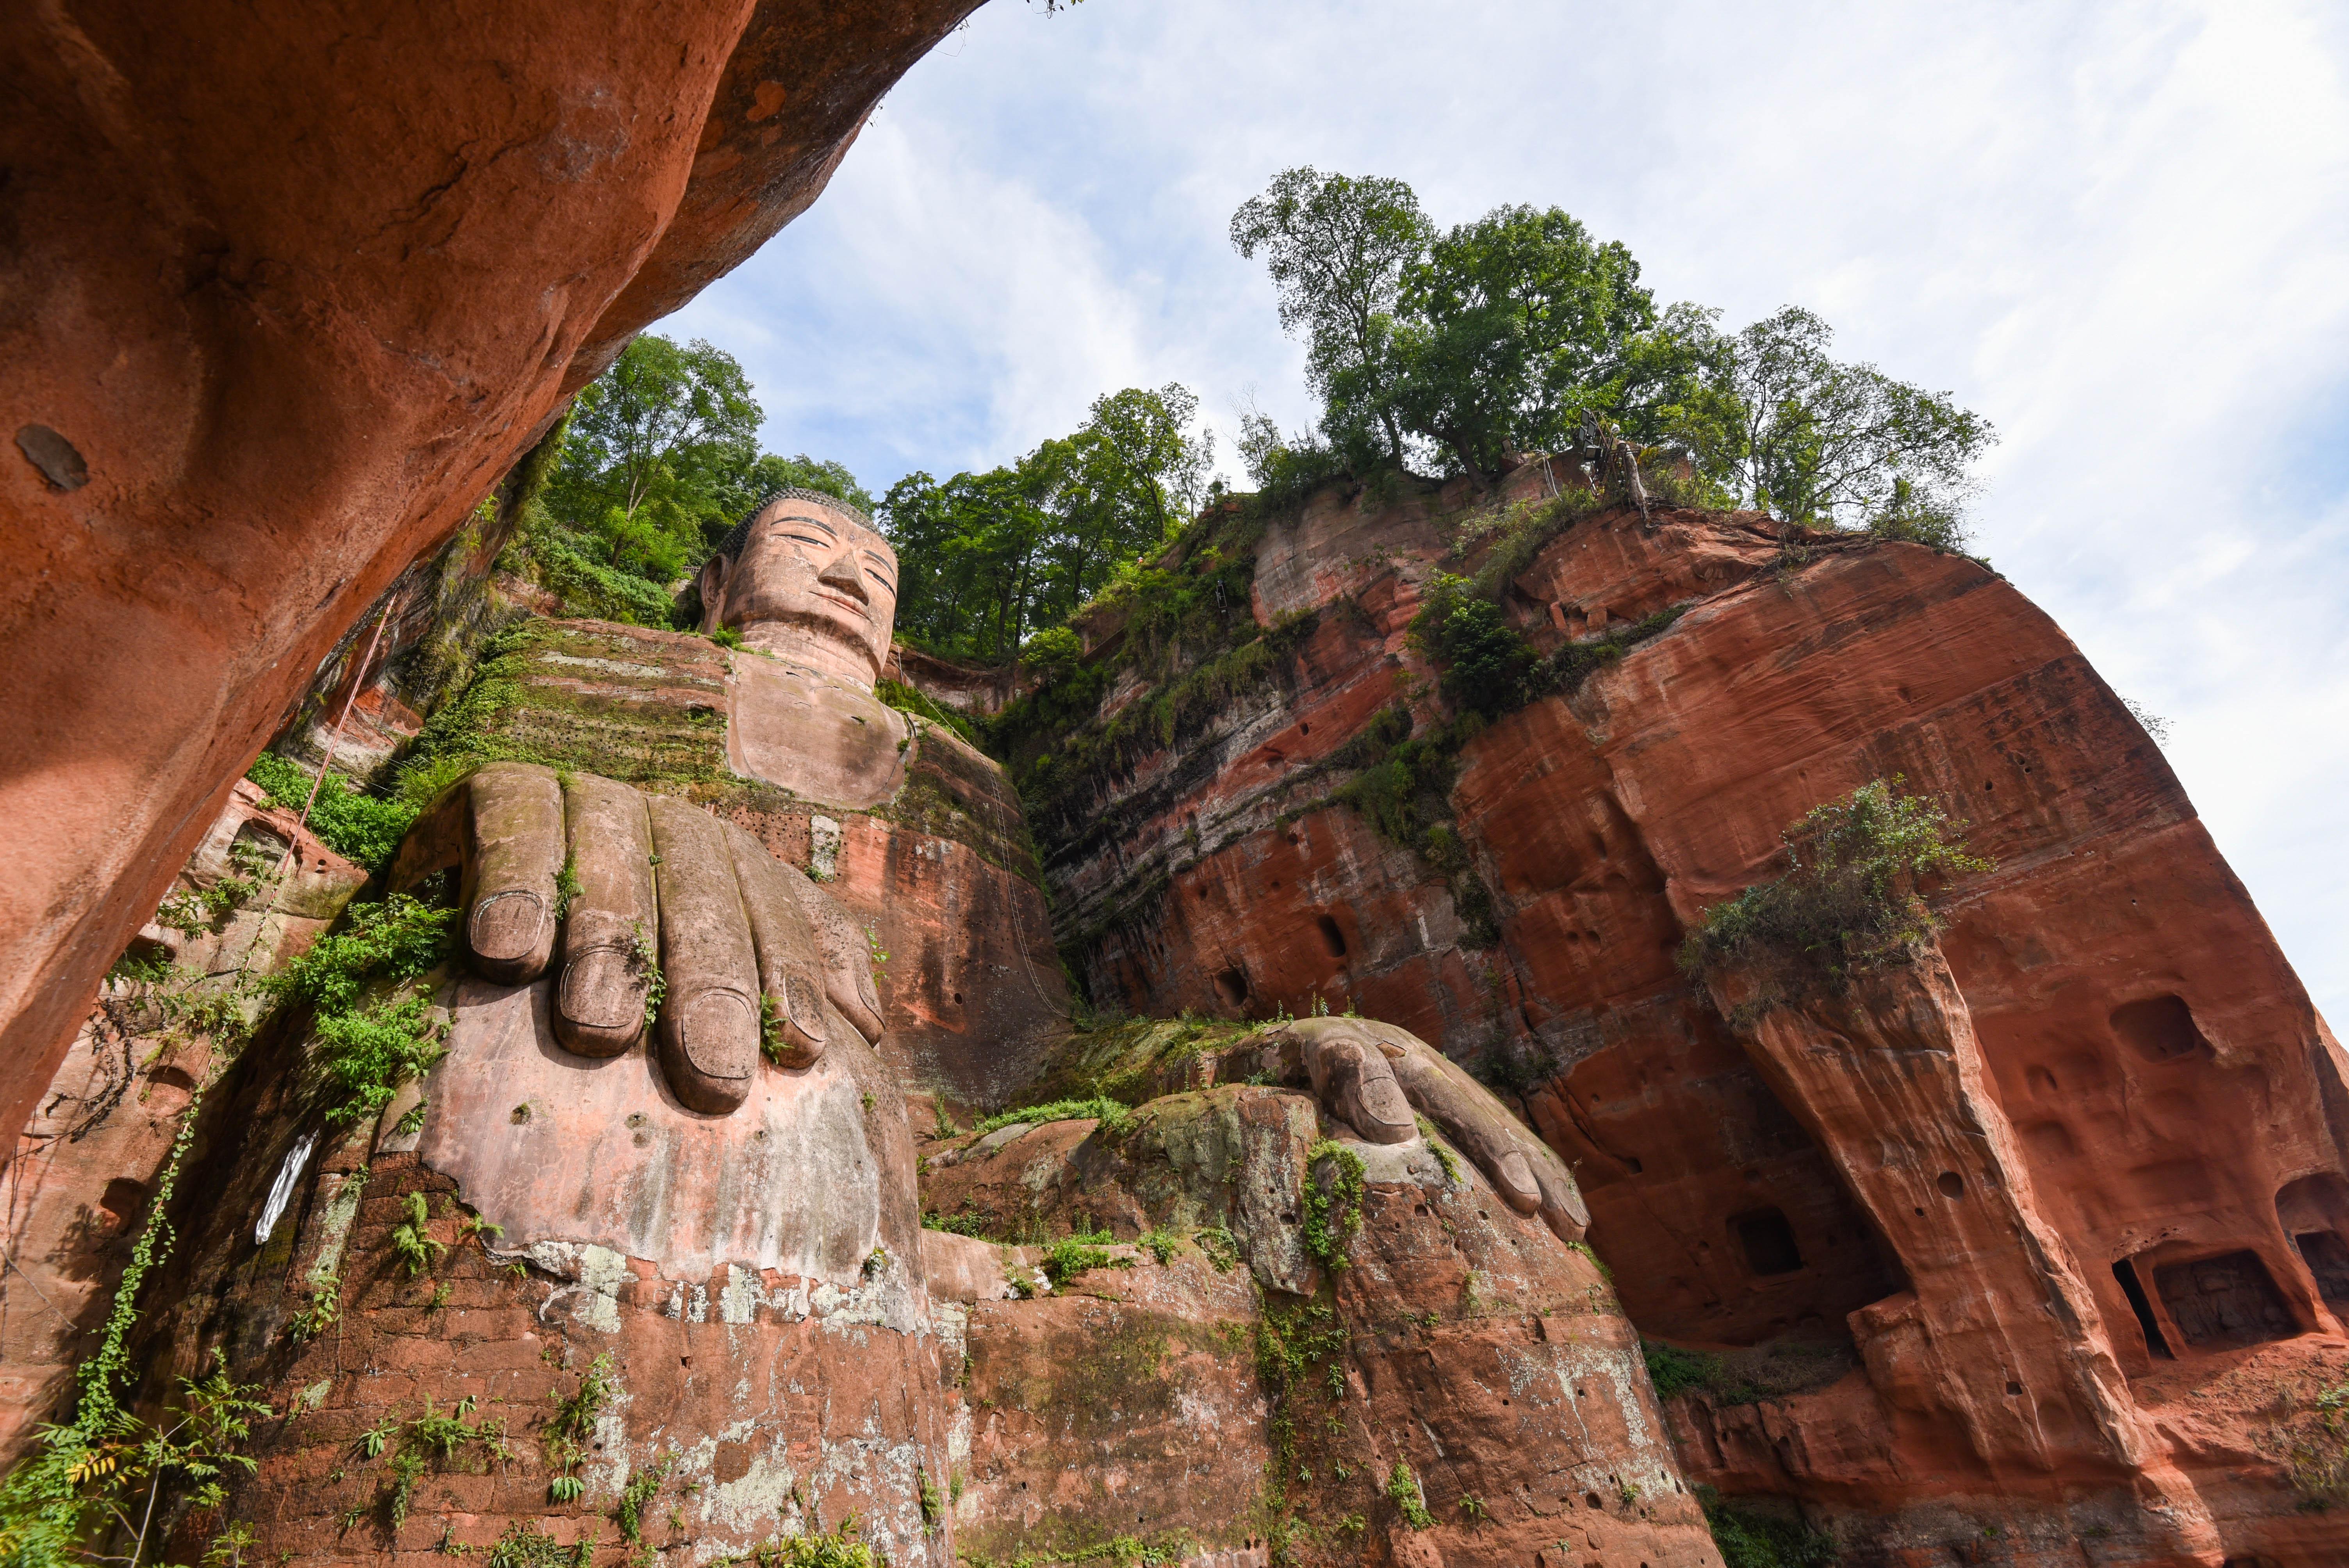 Le bouddha géant de Leshan @neweyes